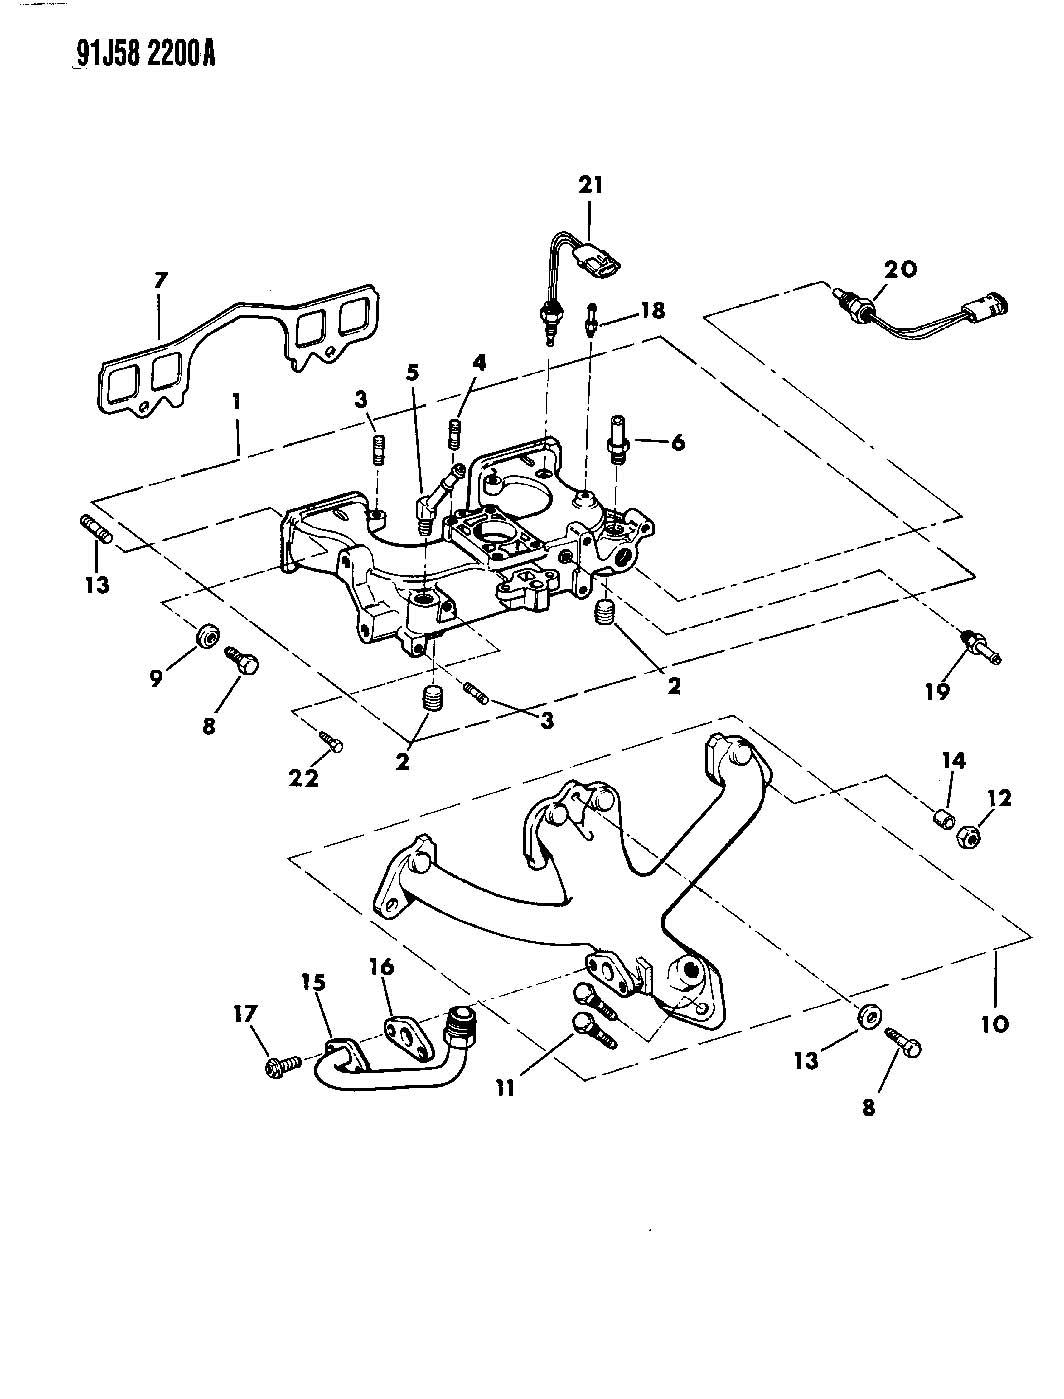 1991 Jeep Cherokee Sensor. Air charge temperature, air